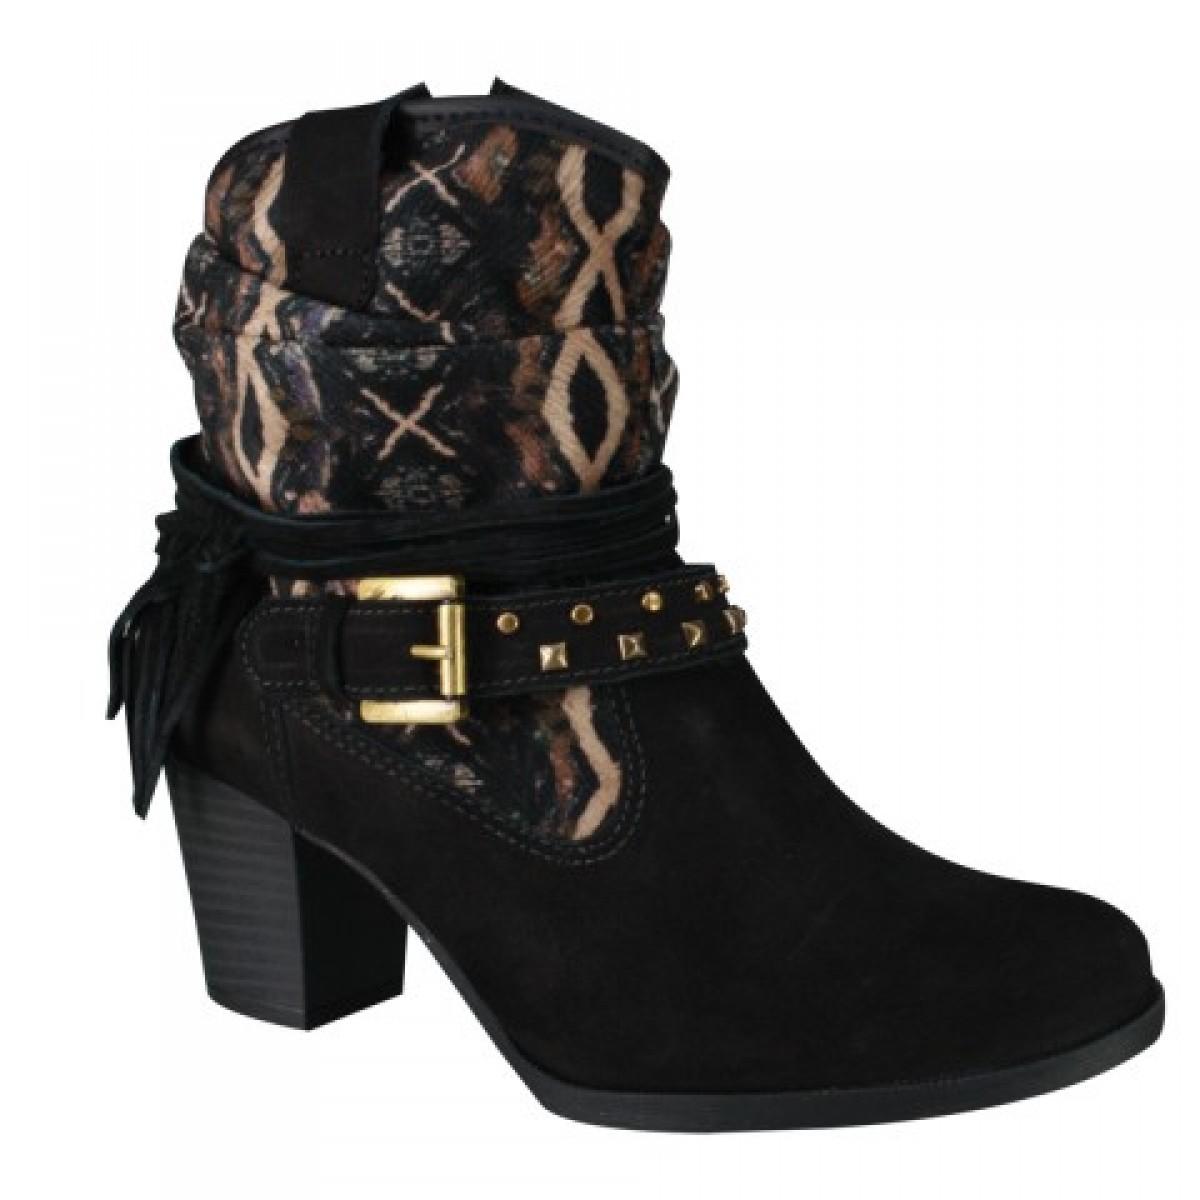 9a06df7976 Bota Feminina Dakota Ankle Boot Preto - Compre Agora